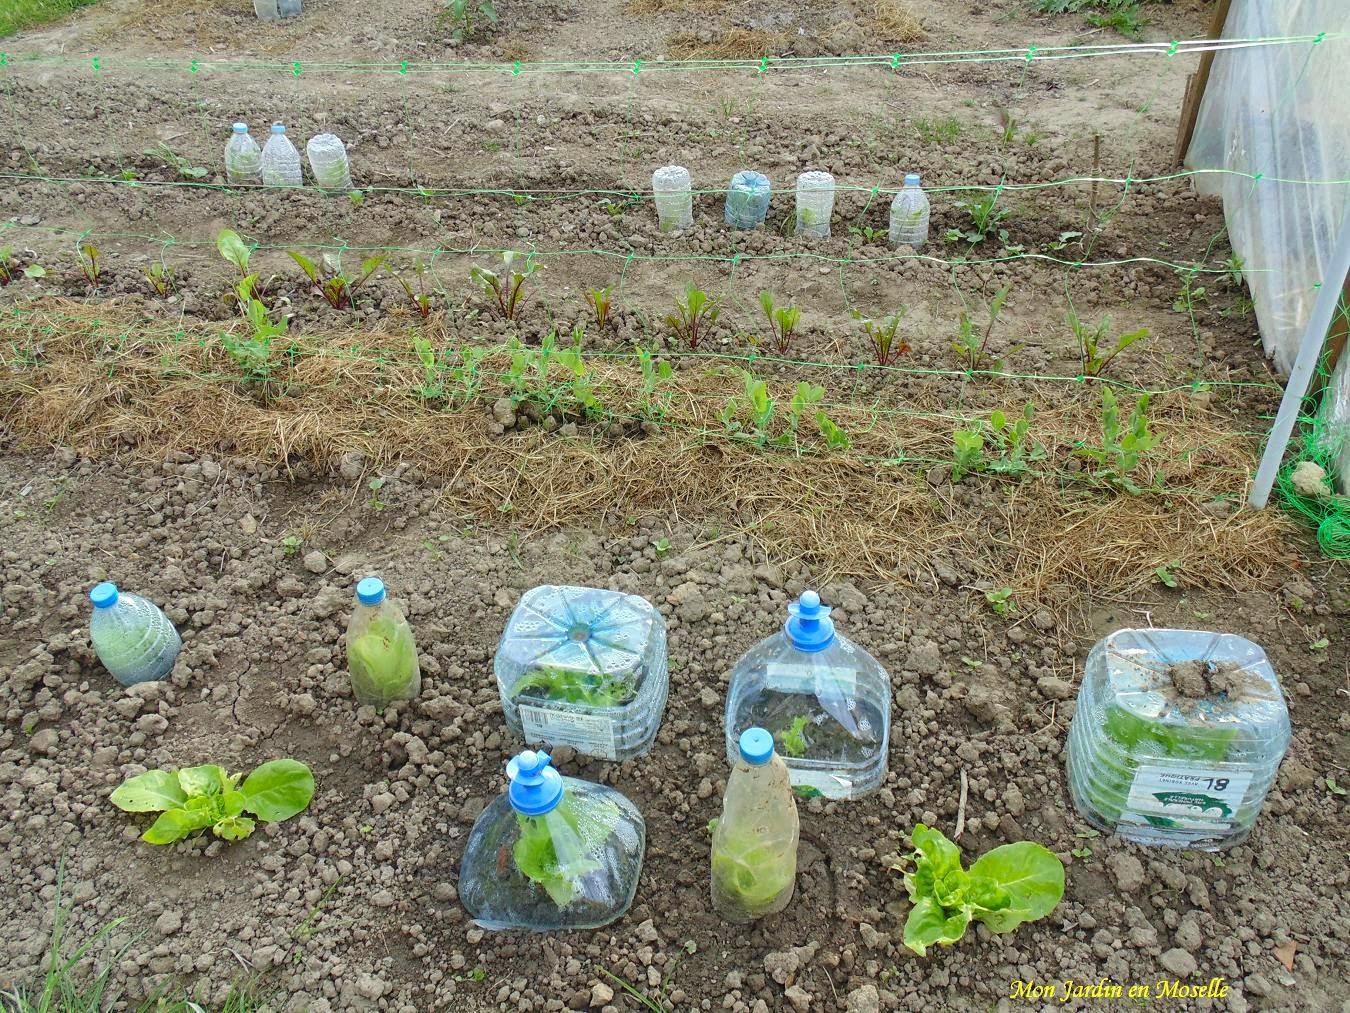 Mon jardin en moselle news du potager for Jardin que planter